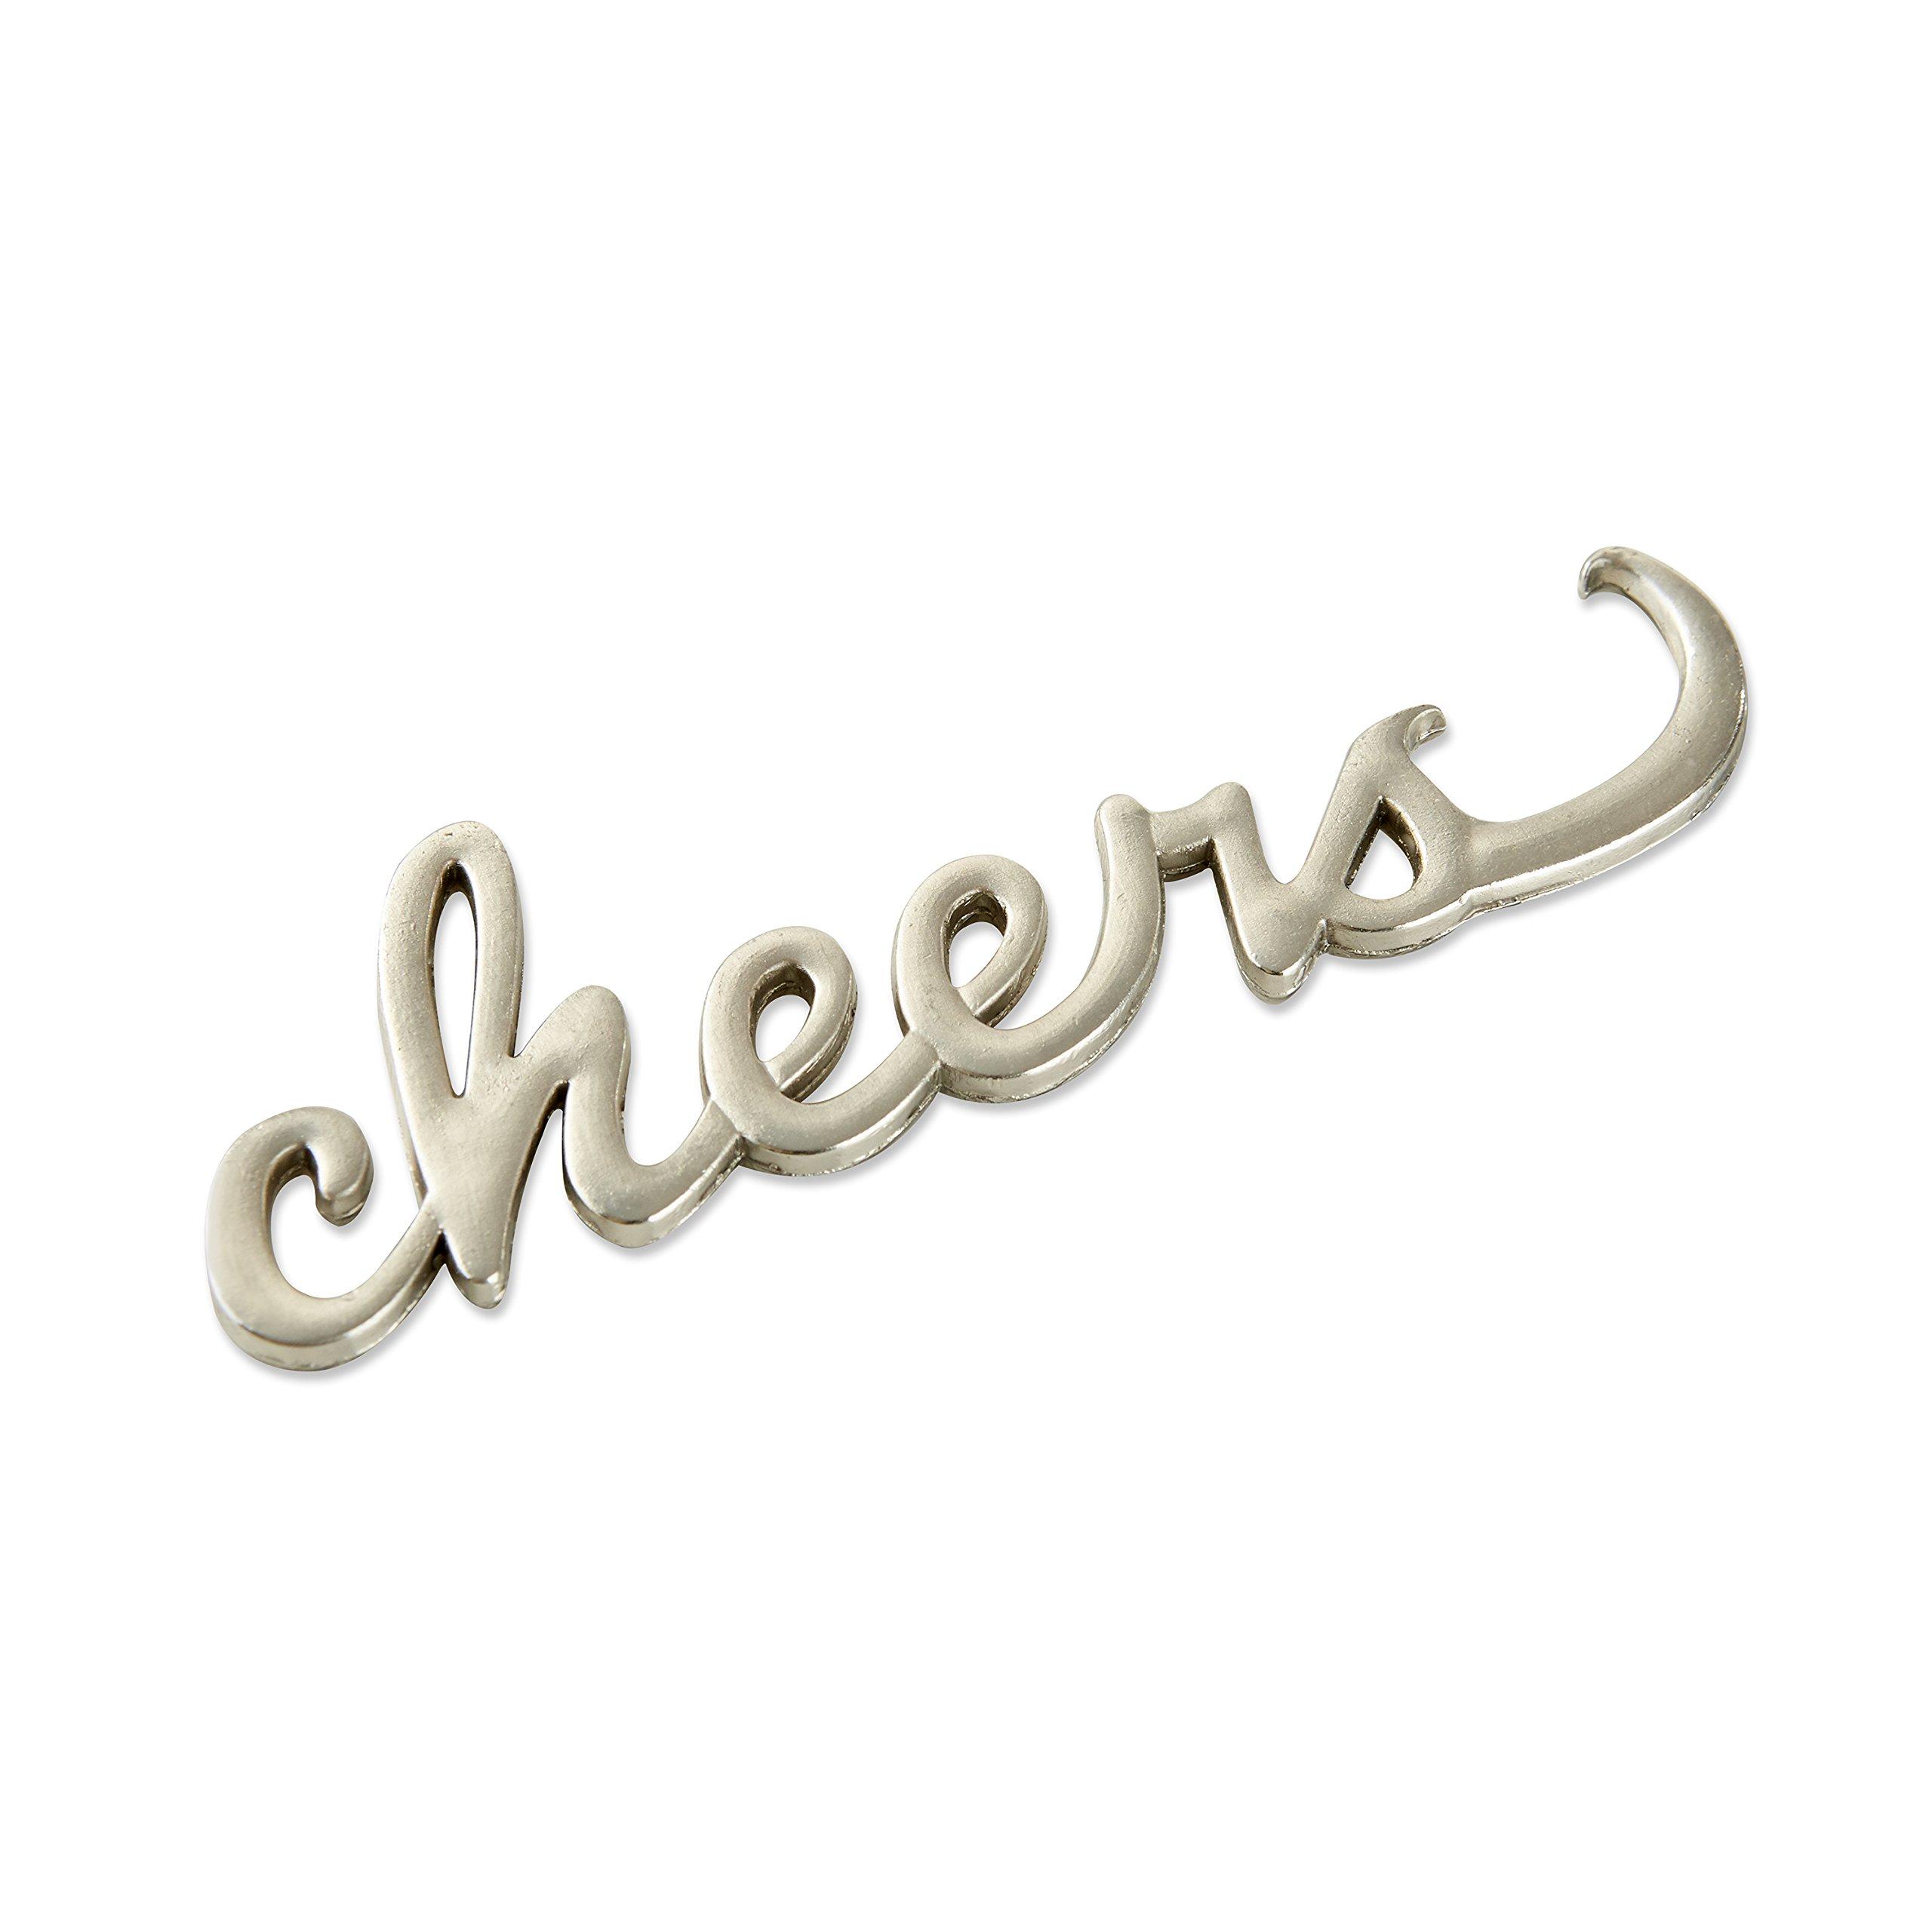 Cheers Bottle Openers (108, Silver)